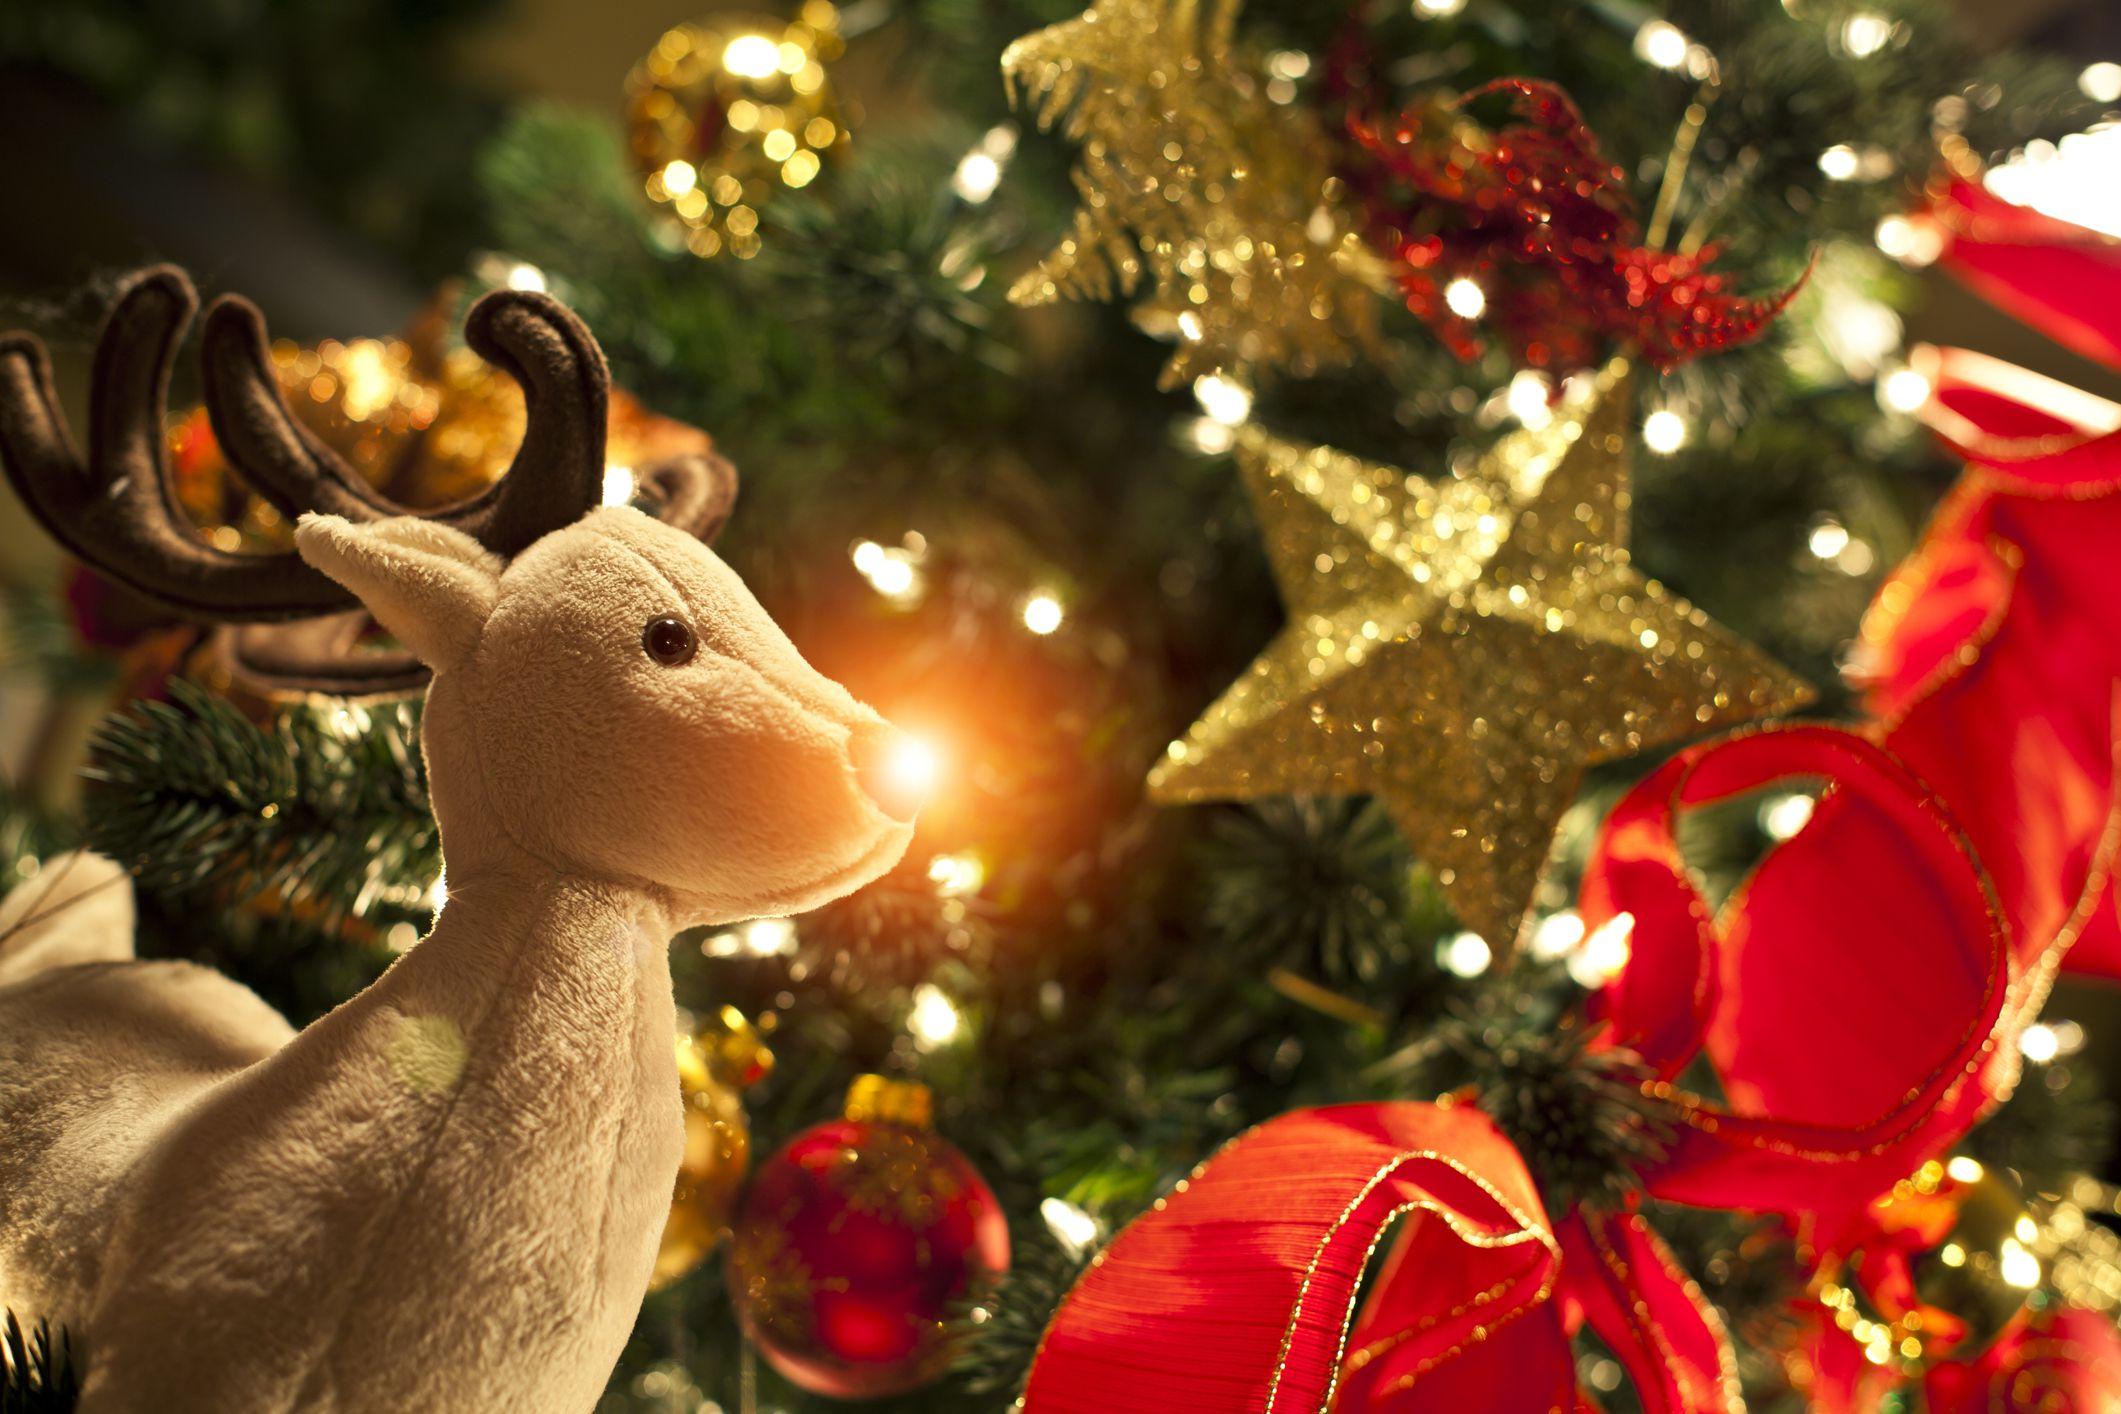 Le Ptit Renne Au Nez Rouge French Christmas Carol